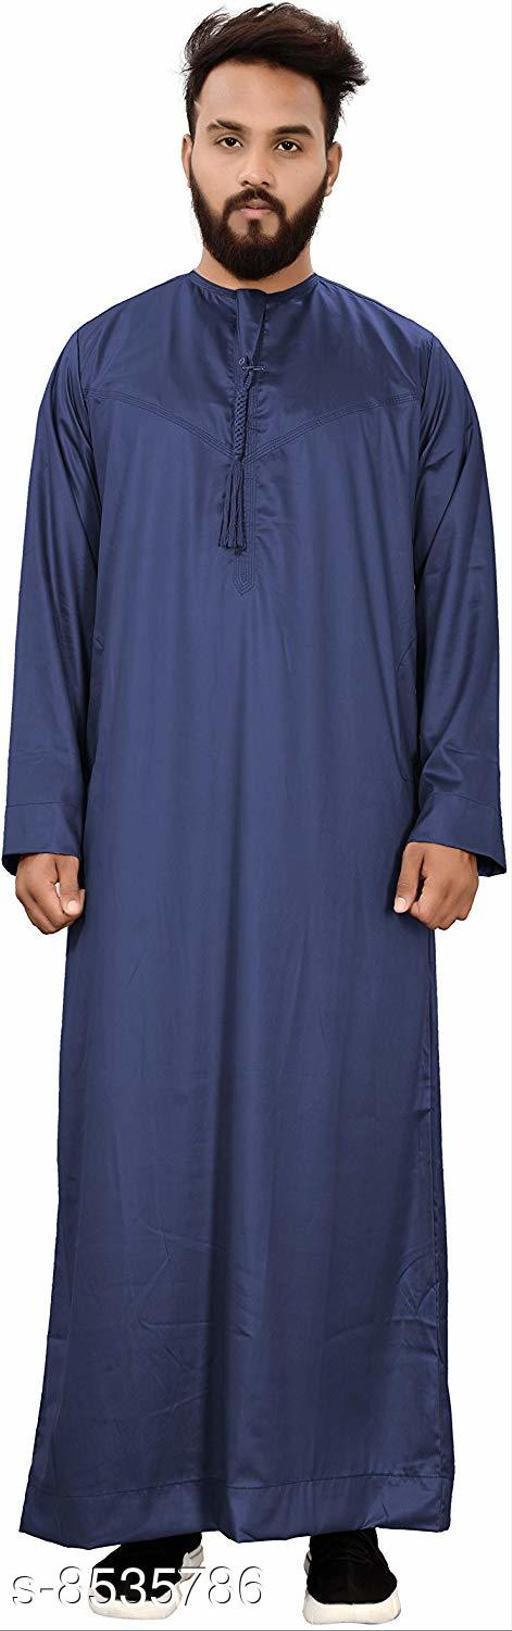 Kurtas Trendy Art Silk Men's Kurta  *Fabric* Cotton  *Combo of* Single  *Sizes*  M  *Sizes Available* M *    Catalog Name: Fancy Men Kurtas CatalogID_1443445 C66-SC1200 Code: 048-8535786-